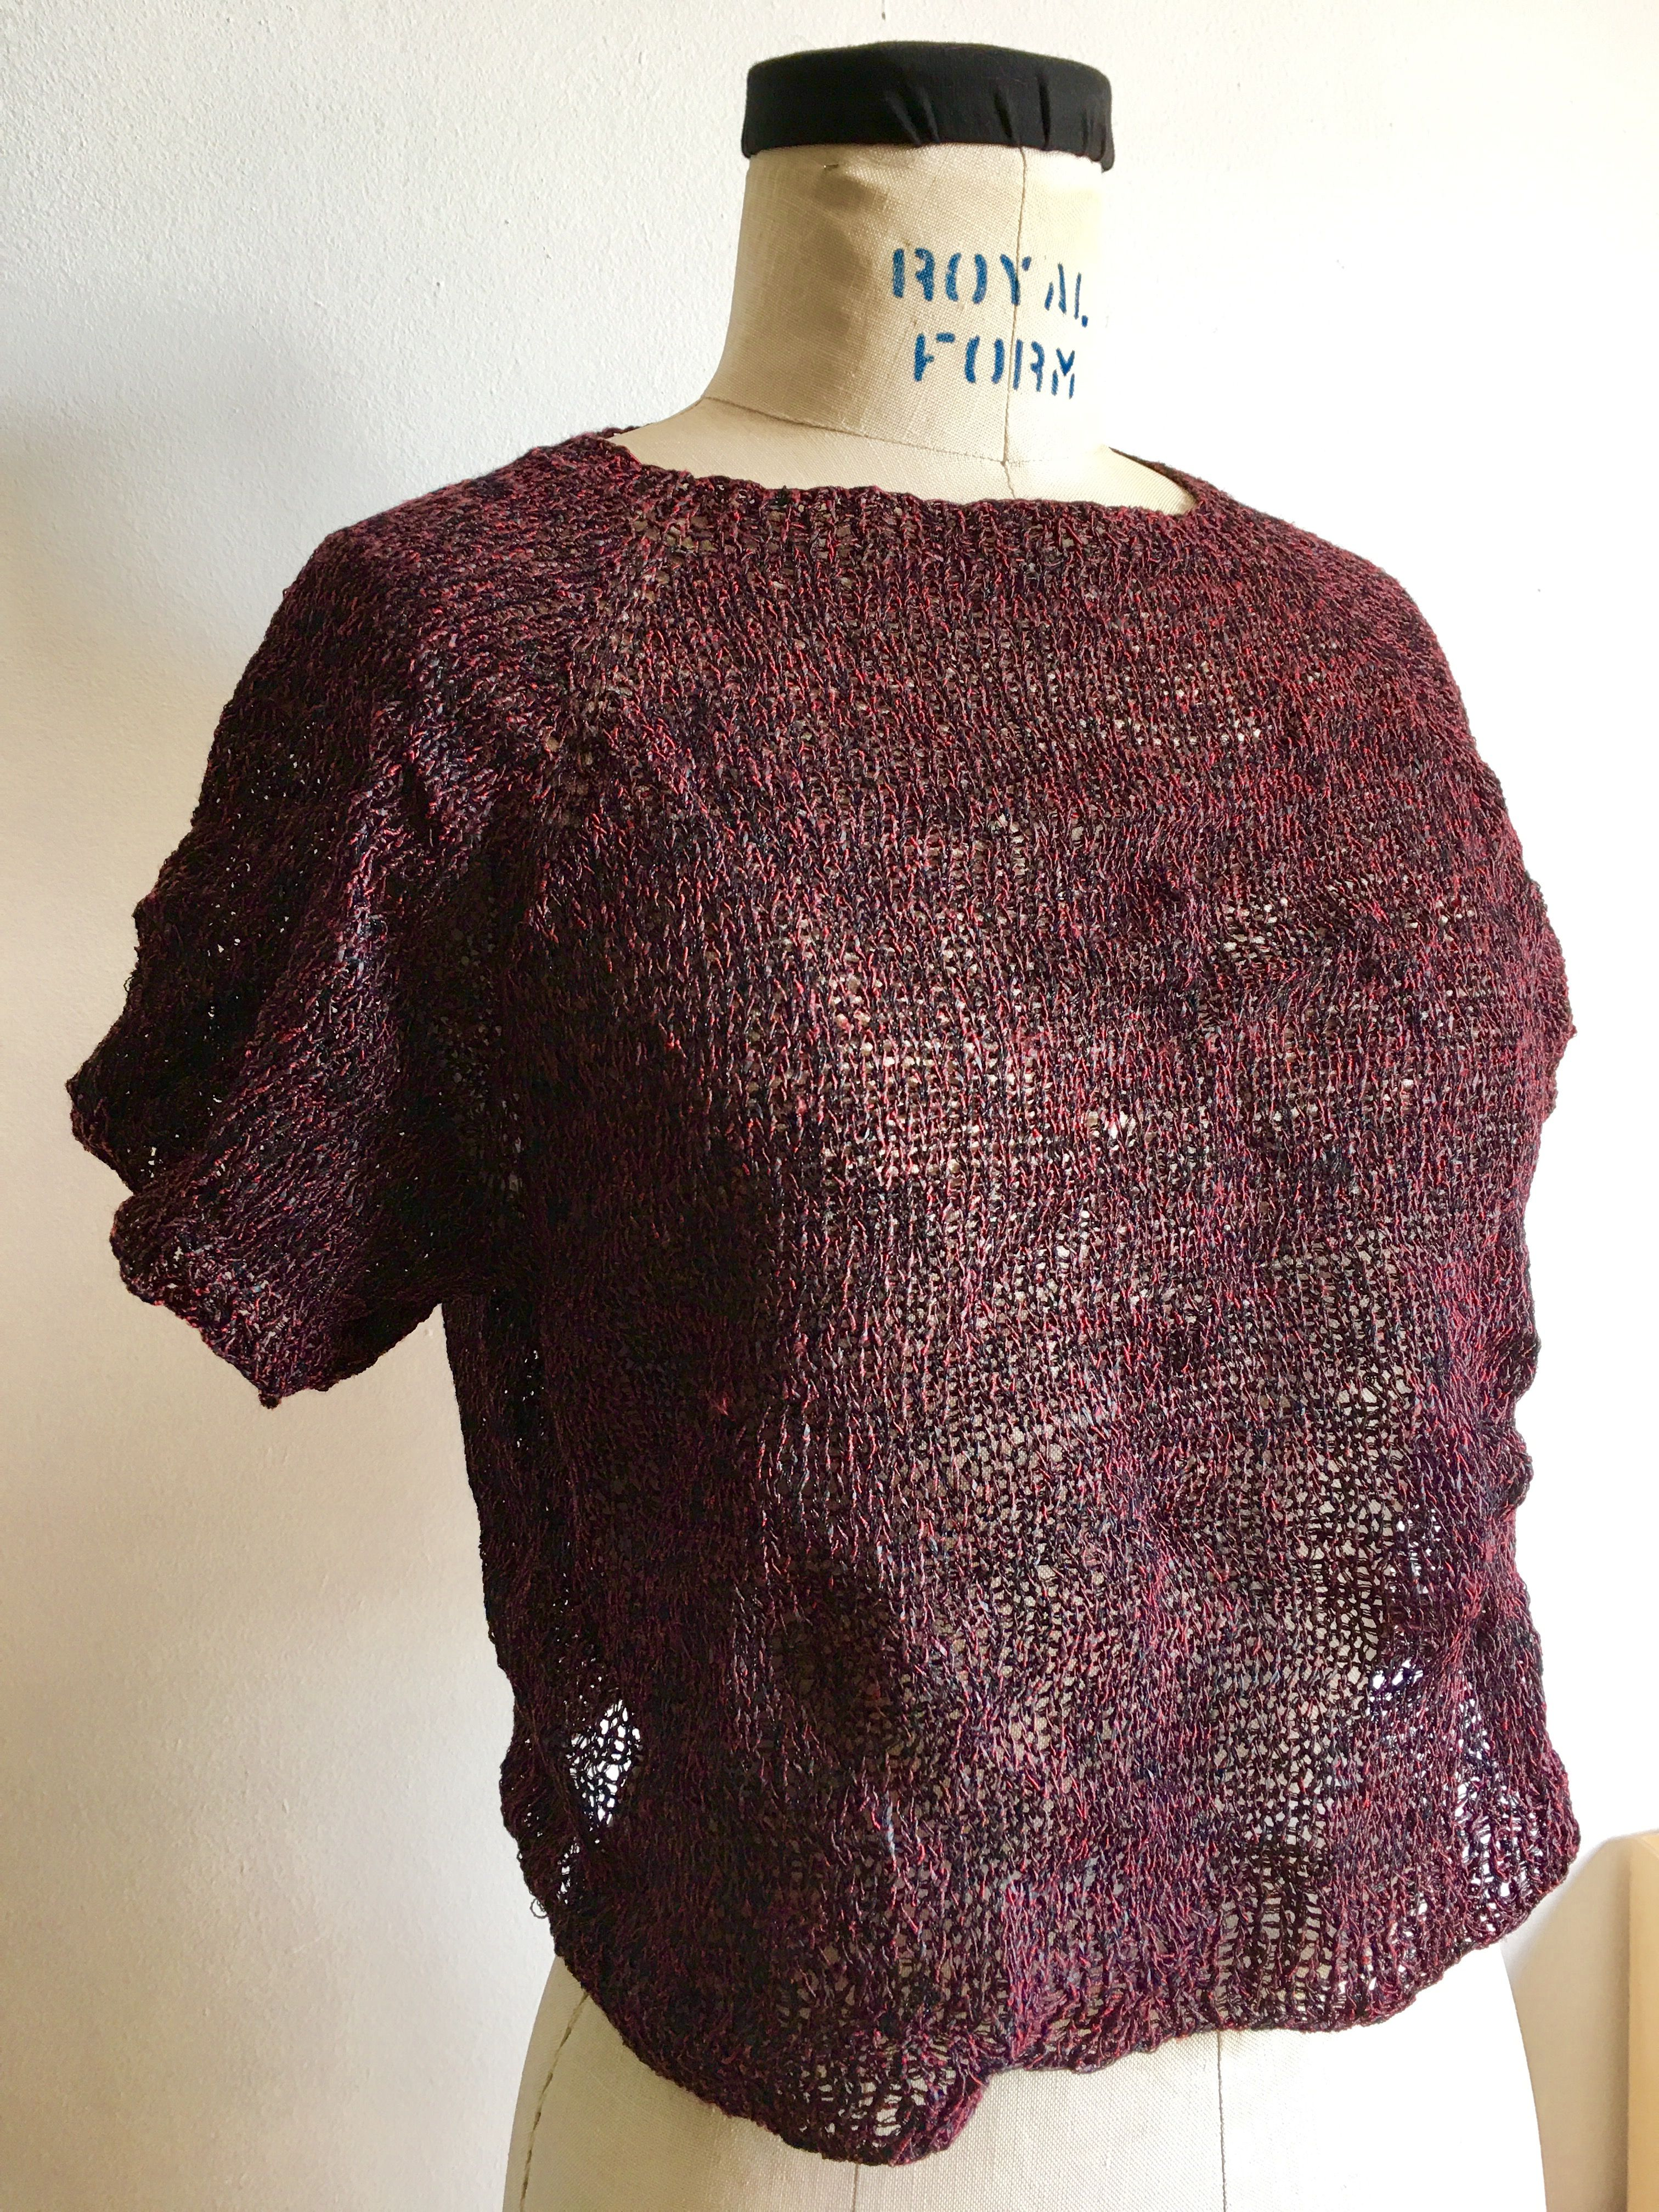 My hand knitting pattern using habu silk wrapped linen paper my hand knitting pattern using habu silk wrapped linen paper lion brands stainless steel wool bankloansurffo Gallery